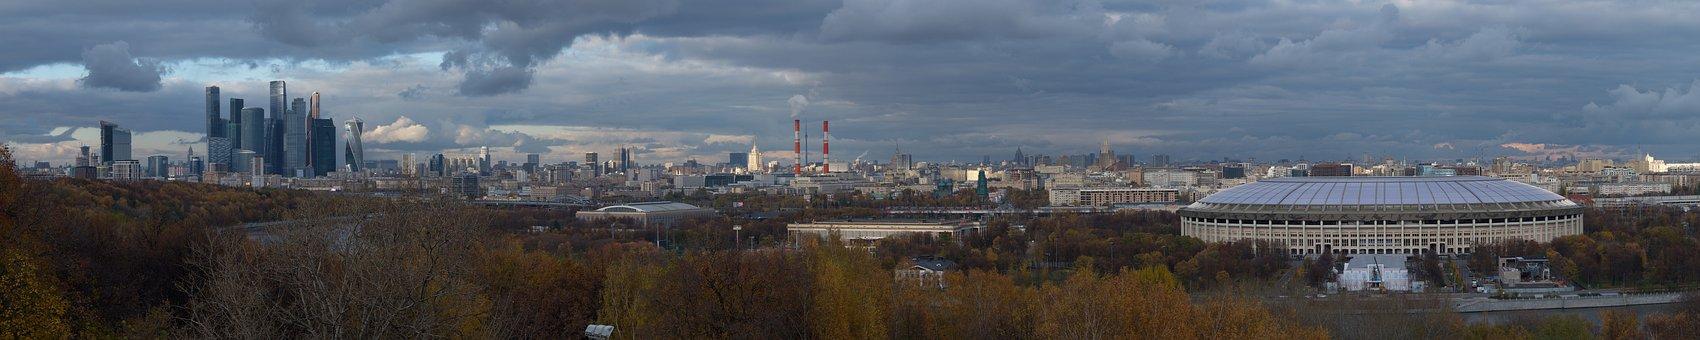 Moscow, Skyline, Panorama, Hills, Russia, City, Urban